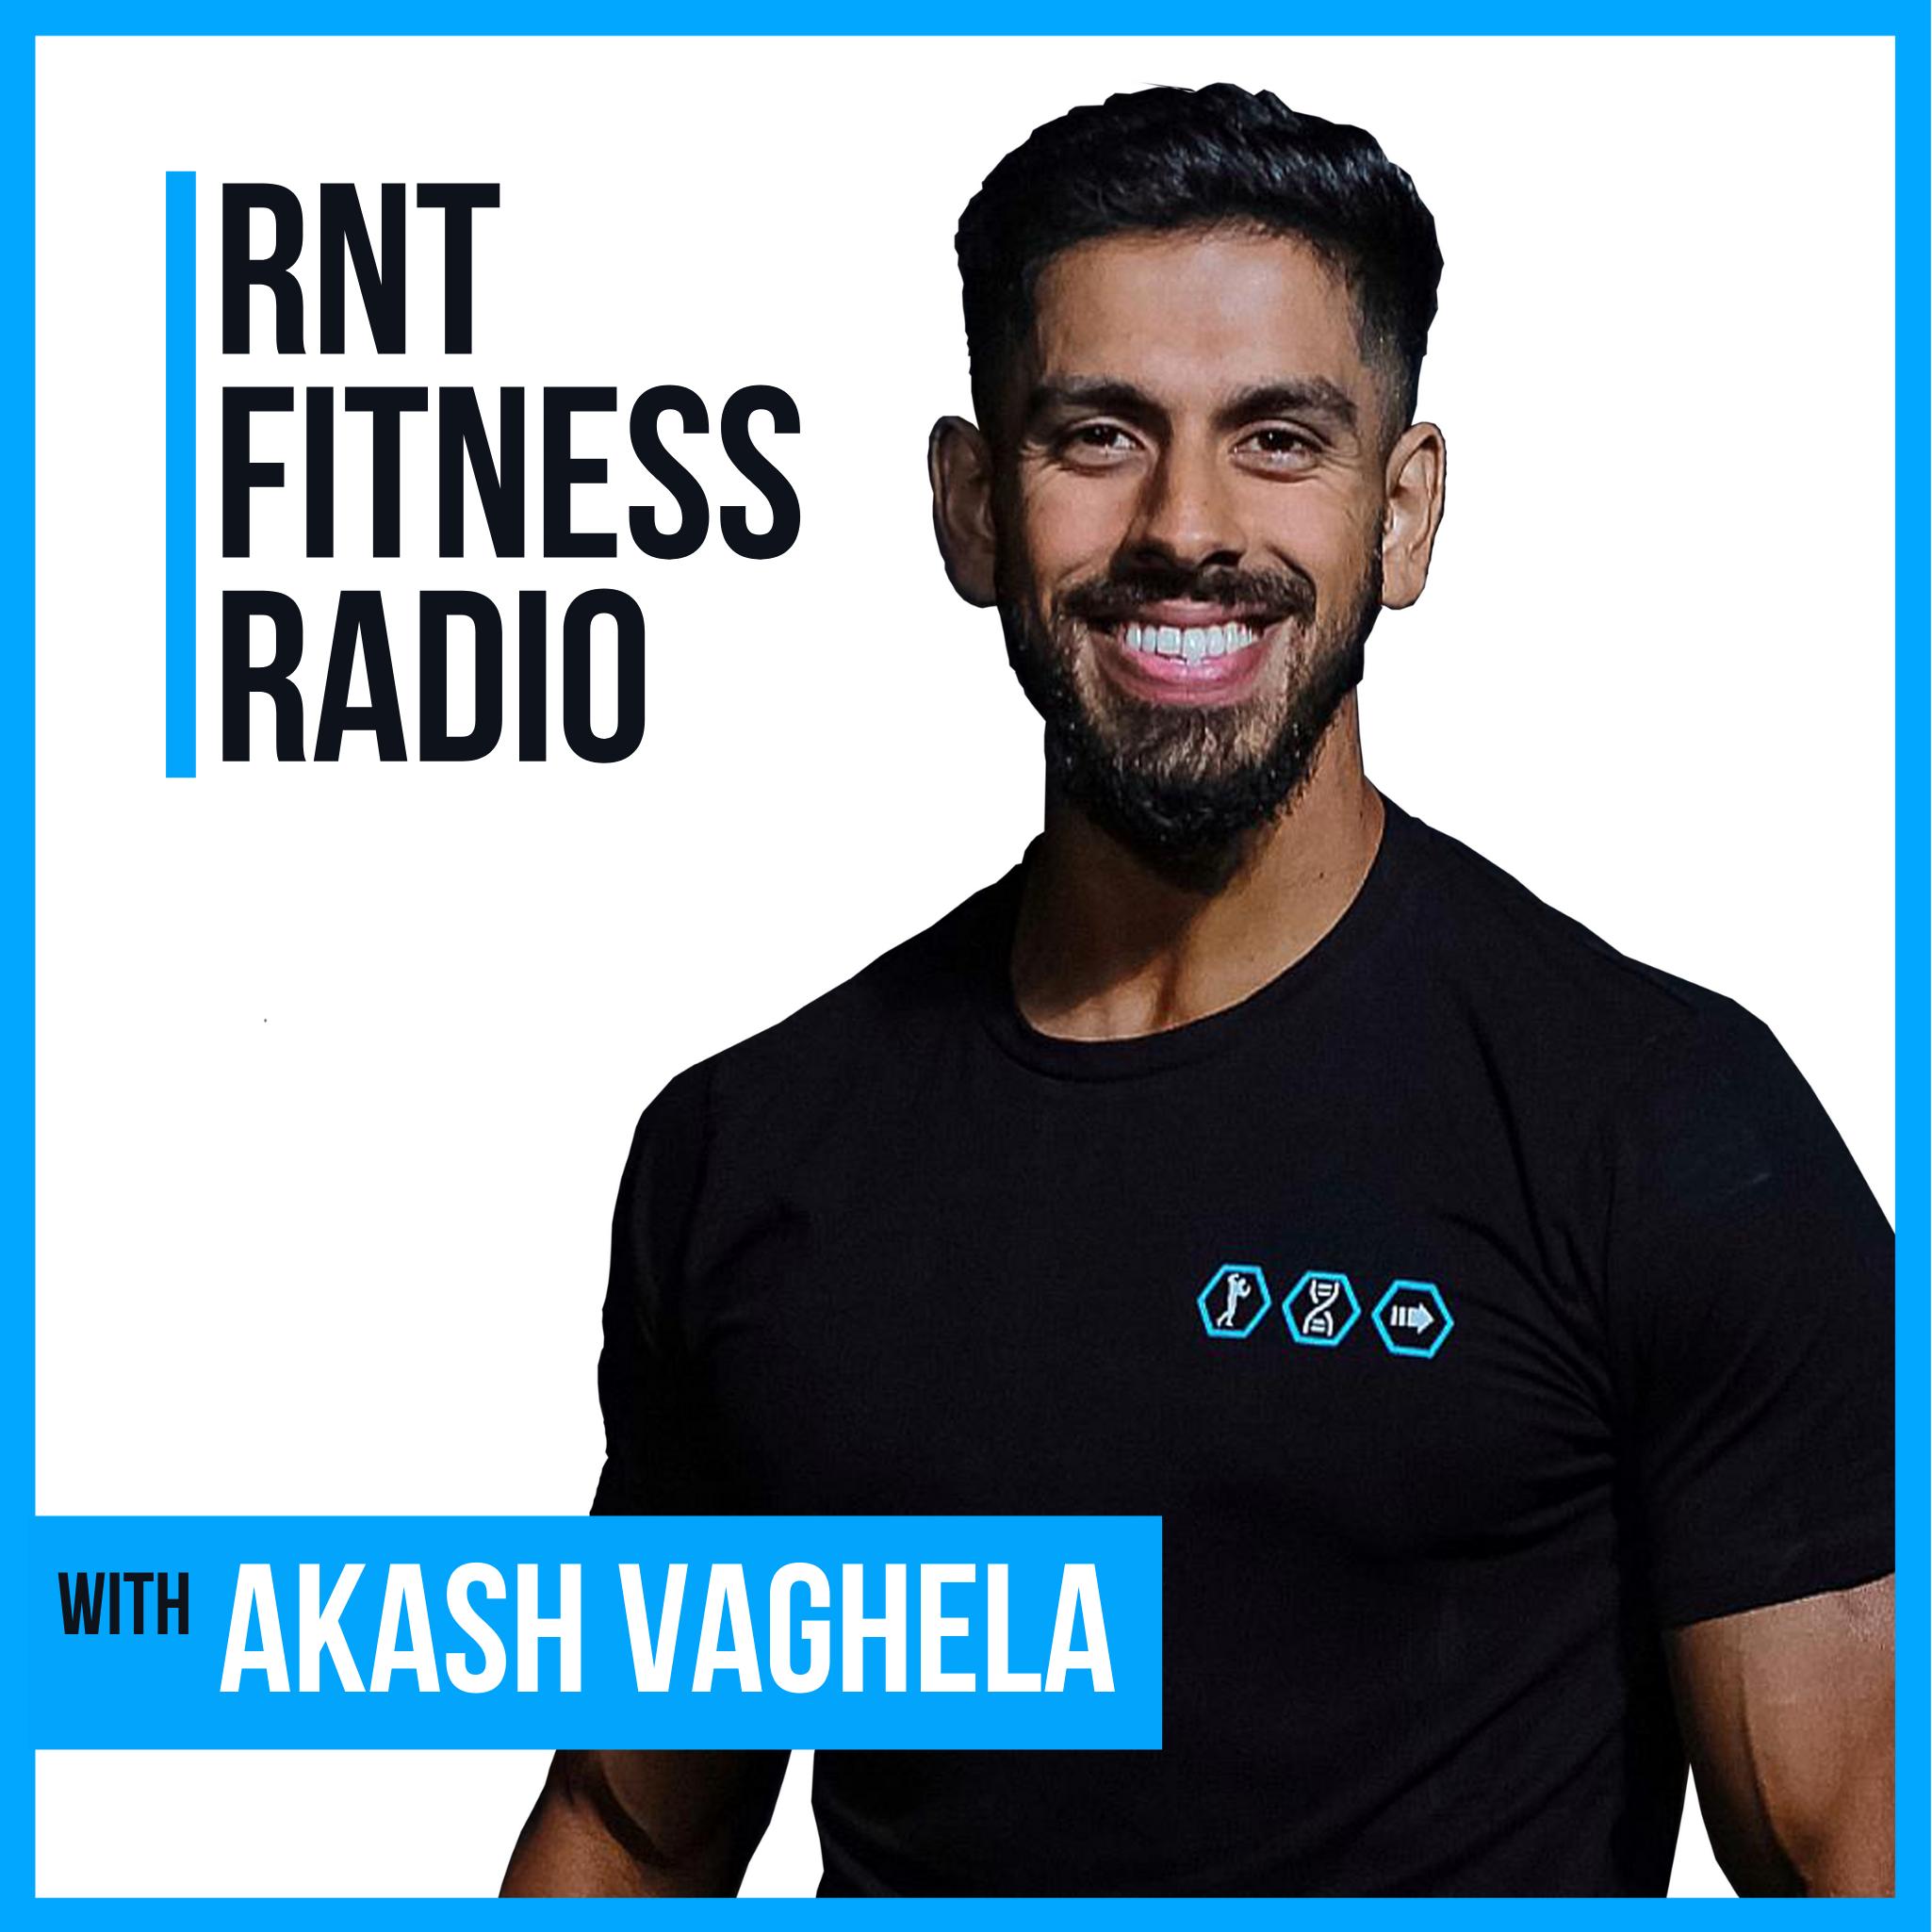 RNT Fitness Radio